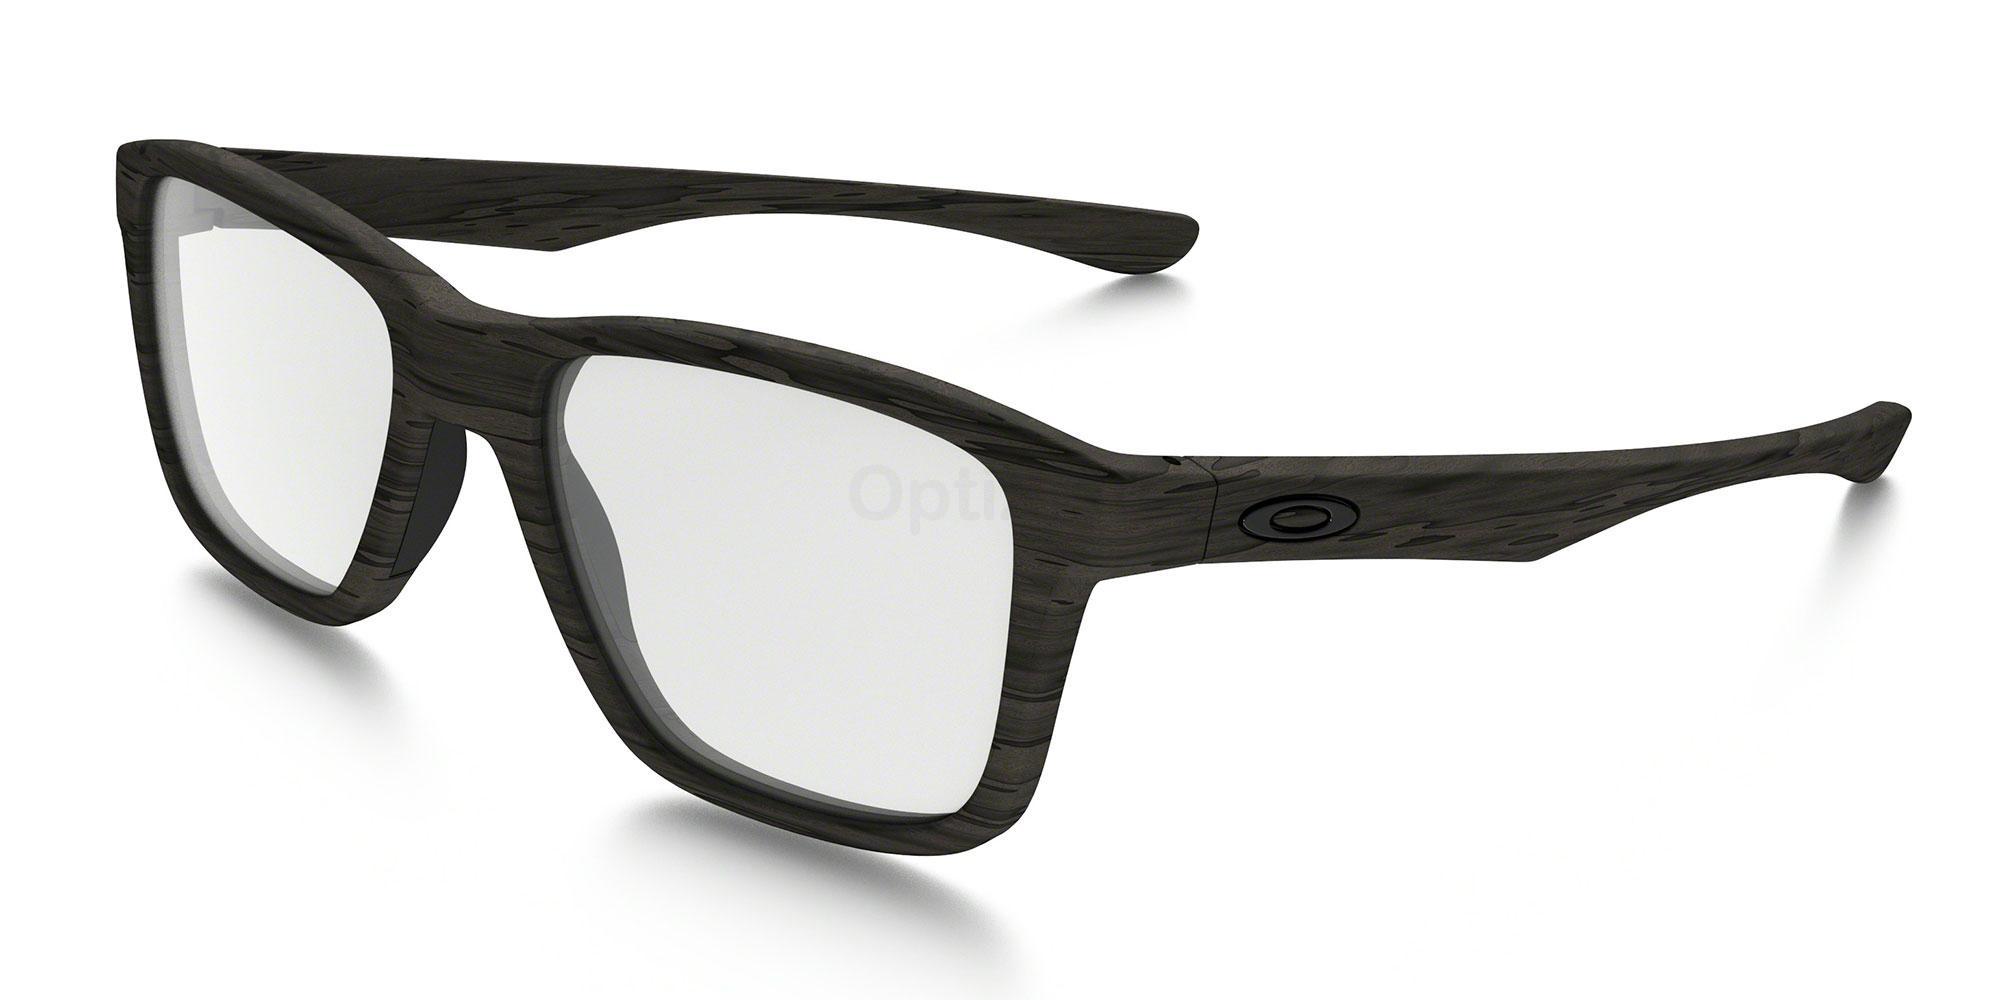 810703 OX8107 TRIM PLANE Glasses, Oakley